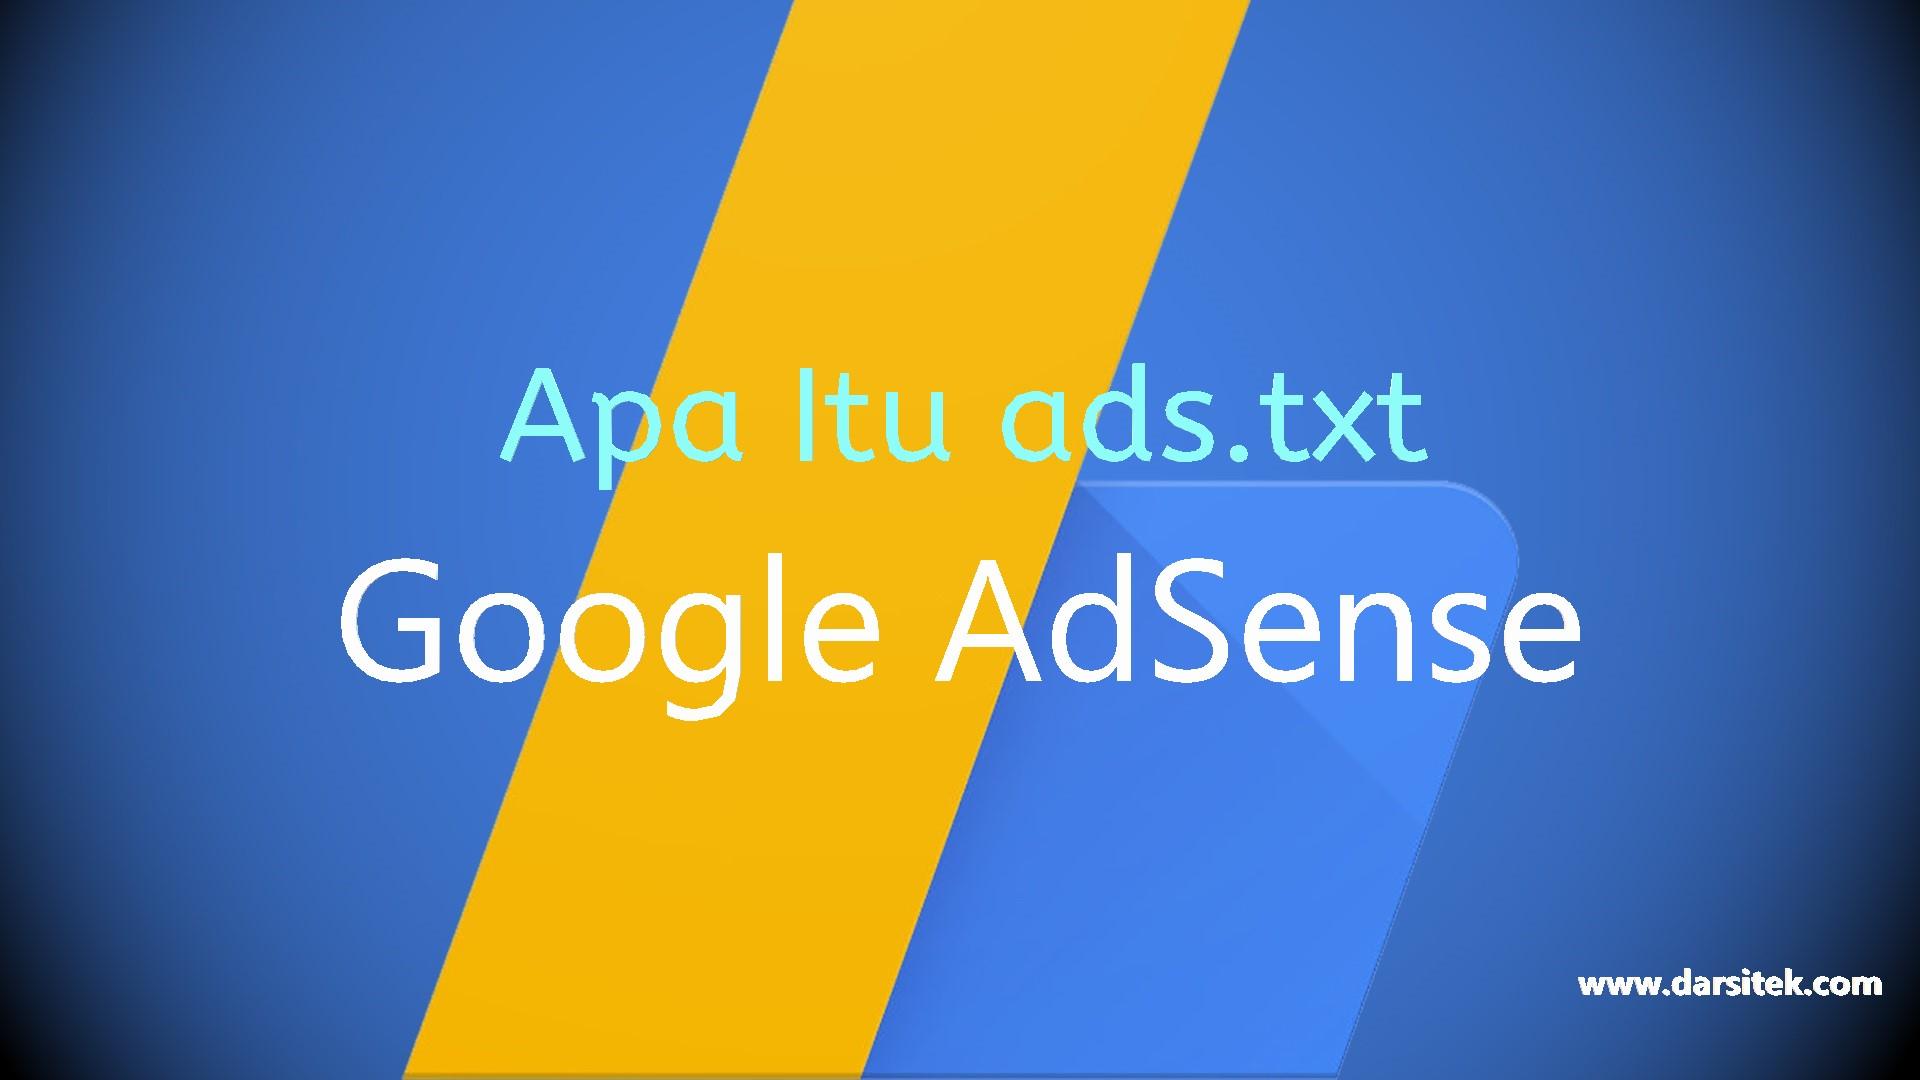 apa itu ads txt pada google adsense